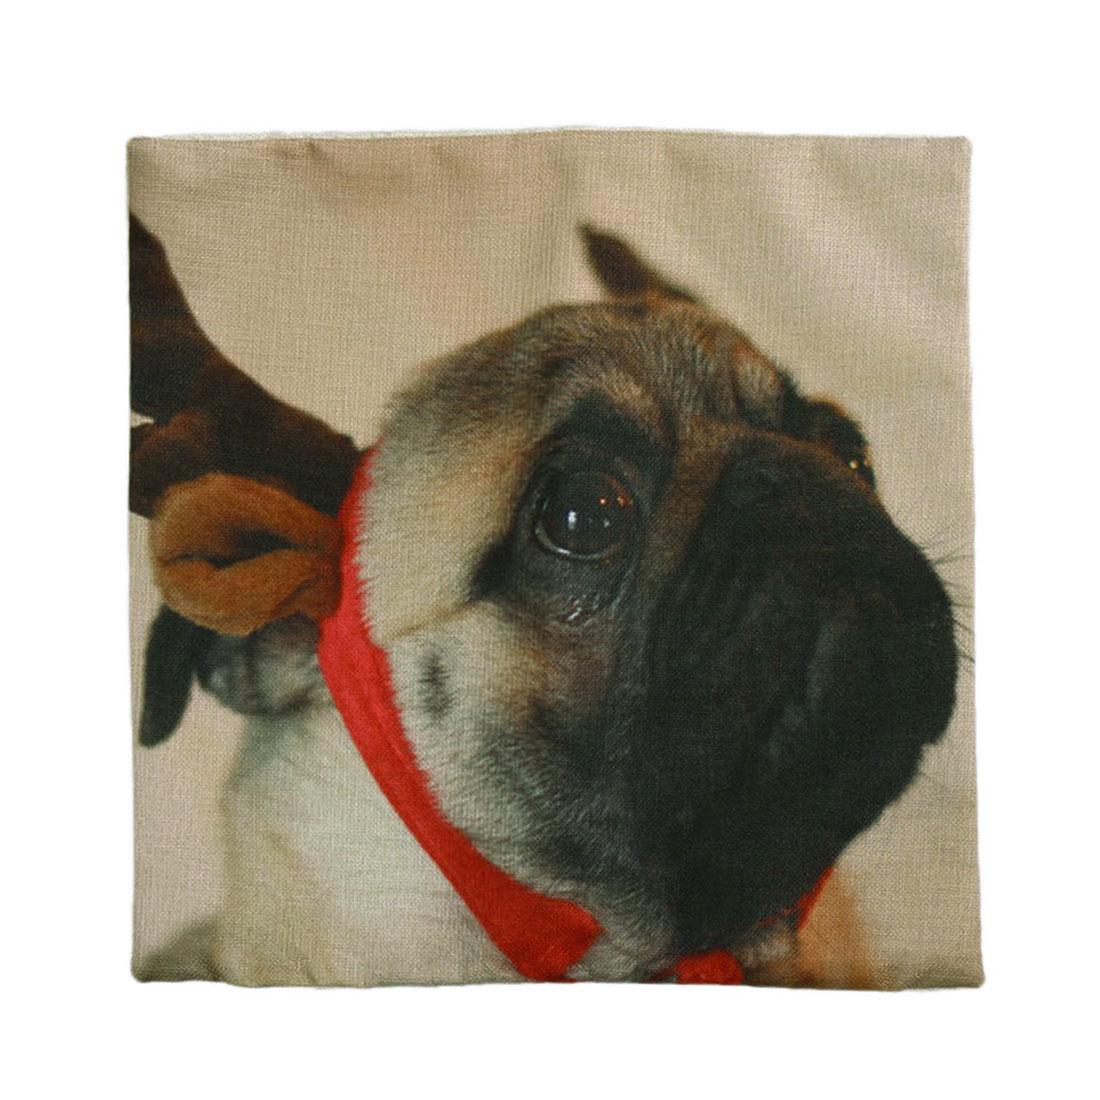 Piccocasa Sofa Decor Dog Pattern Zipper Closure Waist Cushion Pillow Cover Case